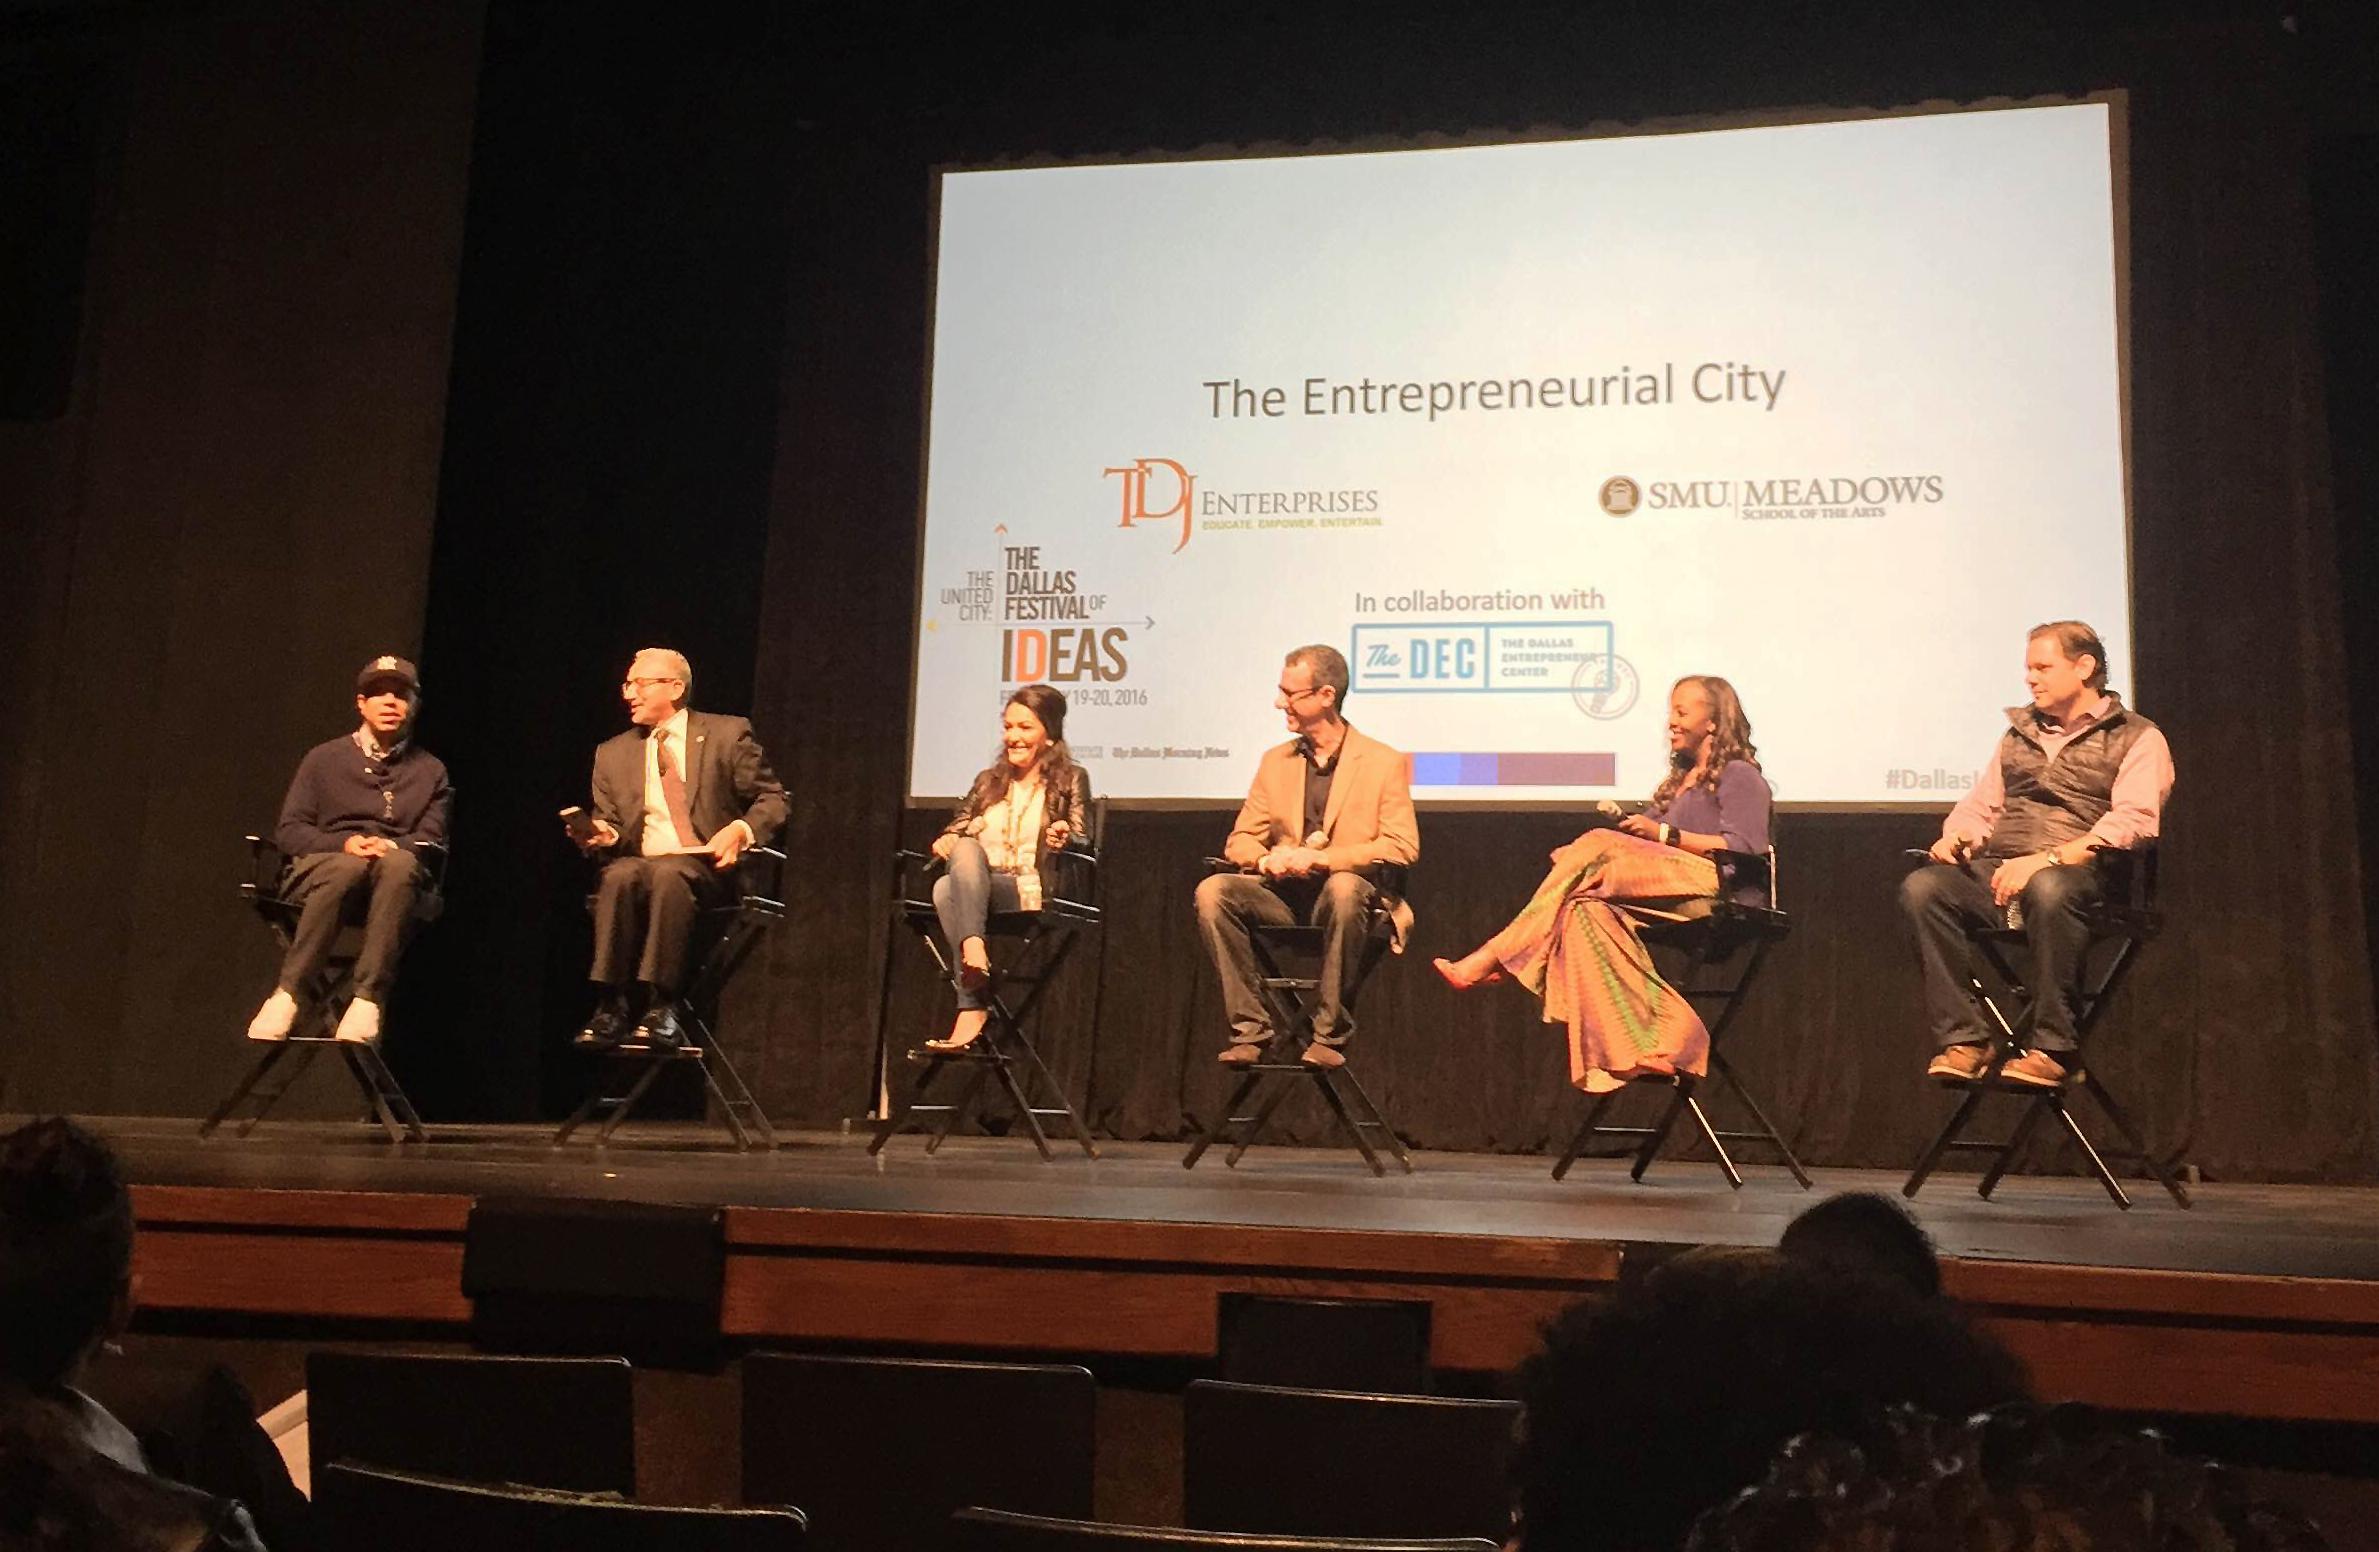 entrepreneurial city